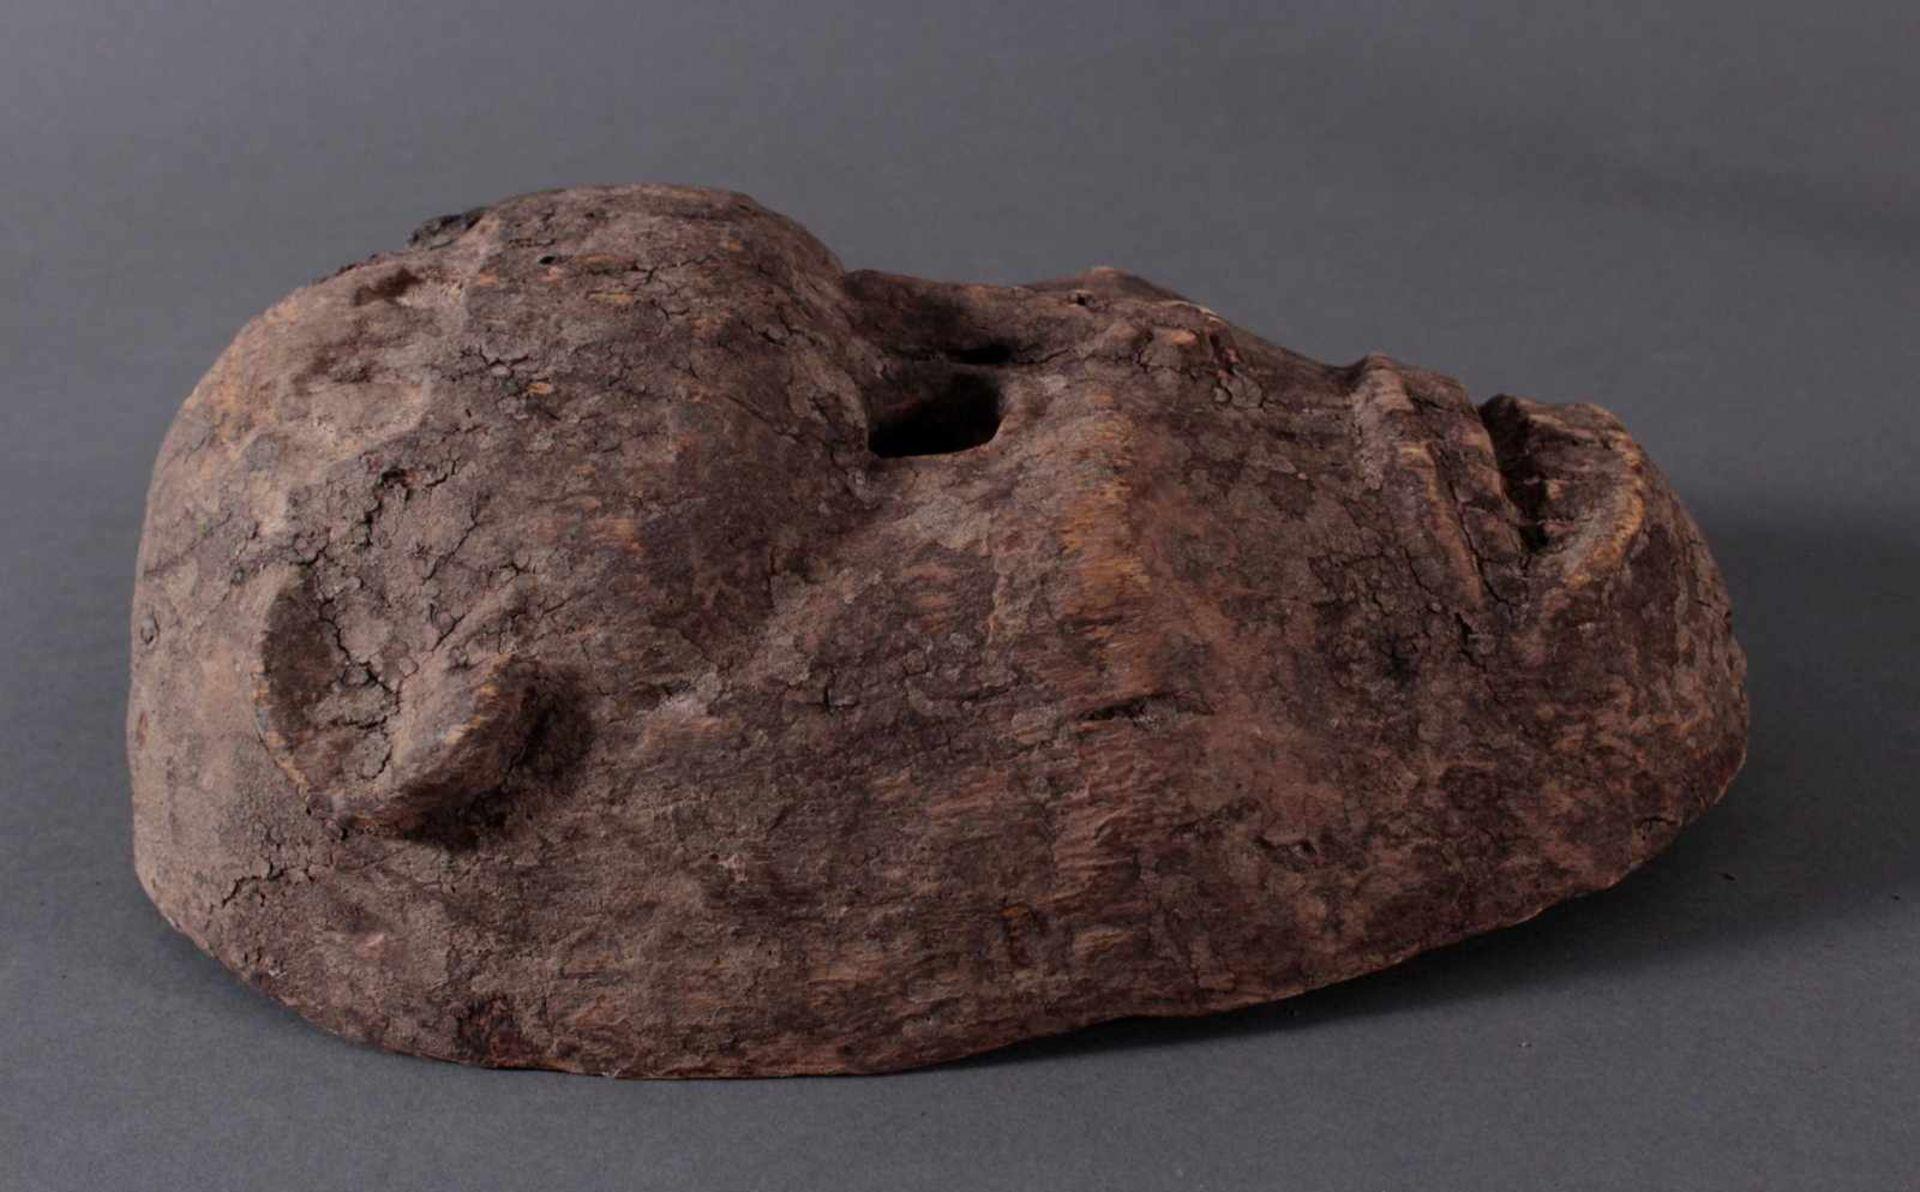 Antike Zoomorphe Maske, Makua, Tansania 1. Hälfte 20. Jh.Hartholzolz, alter Wurmfrass, dunkle Patina - Bild 2 aus 6